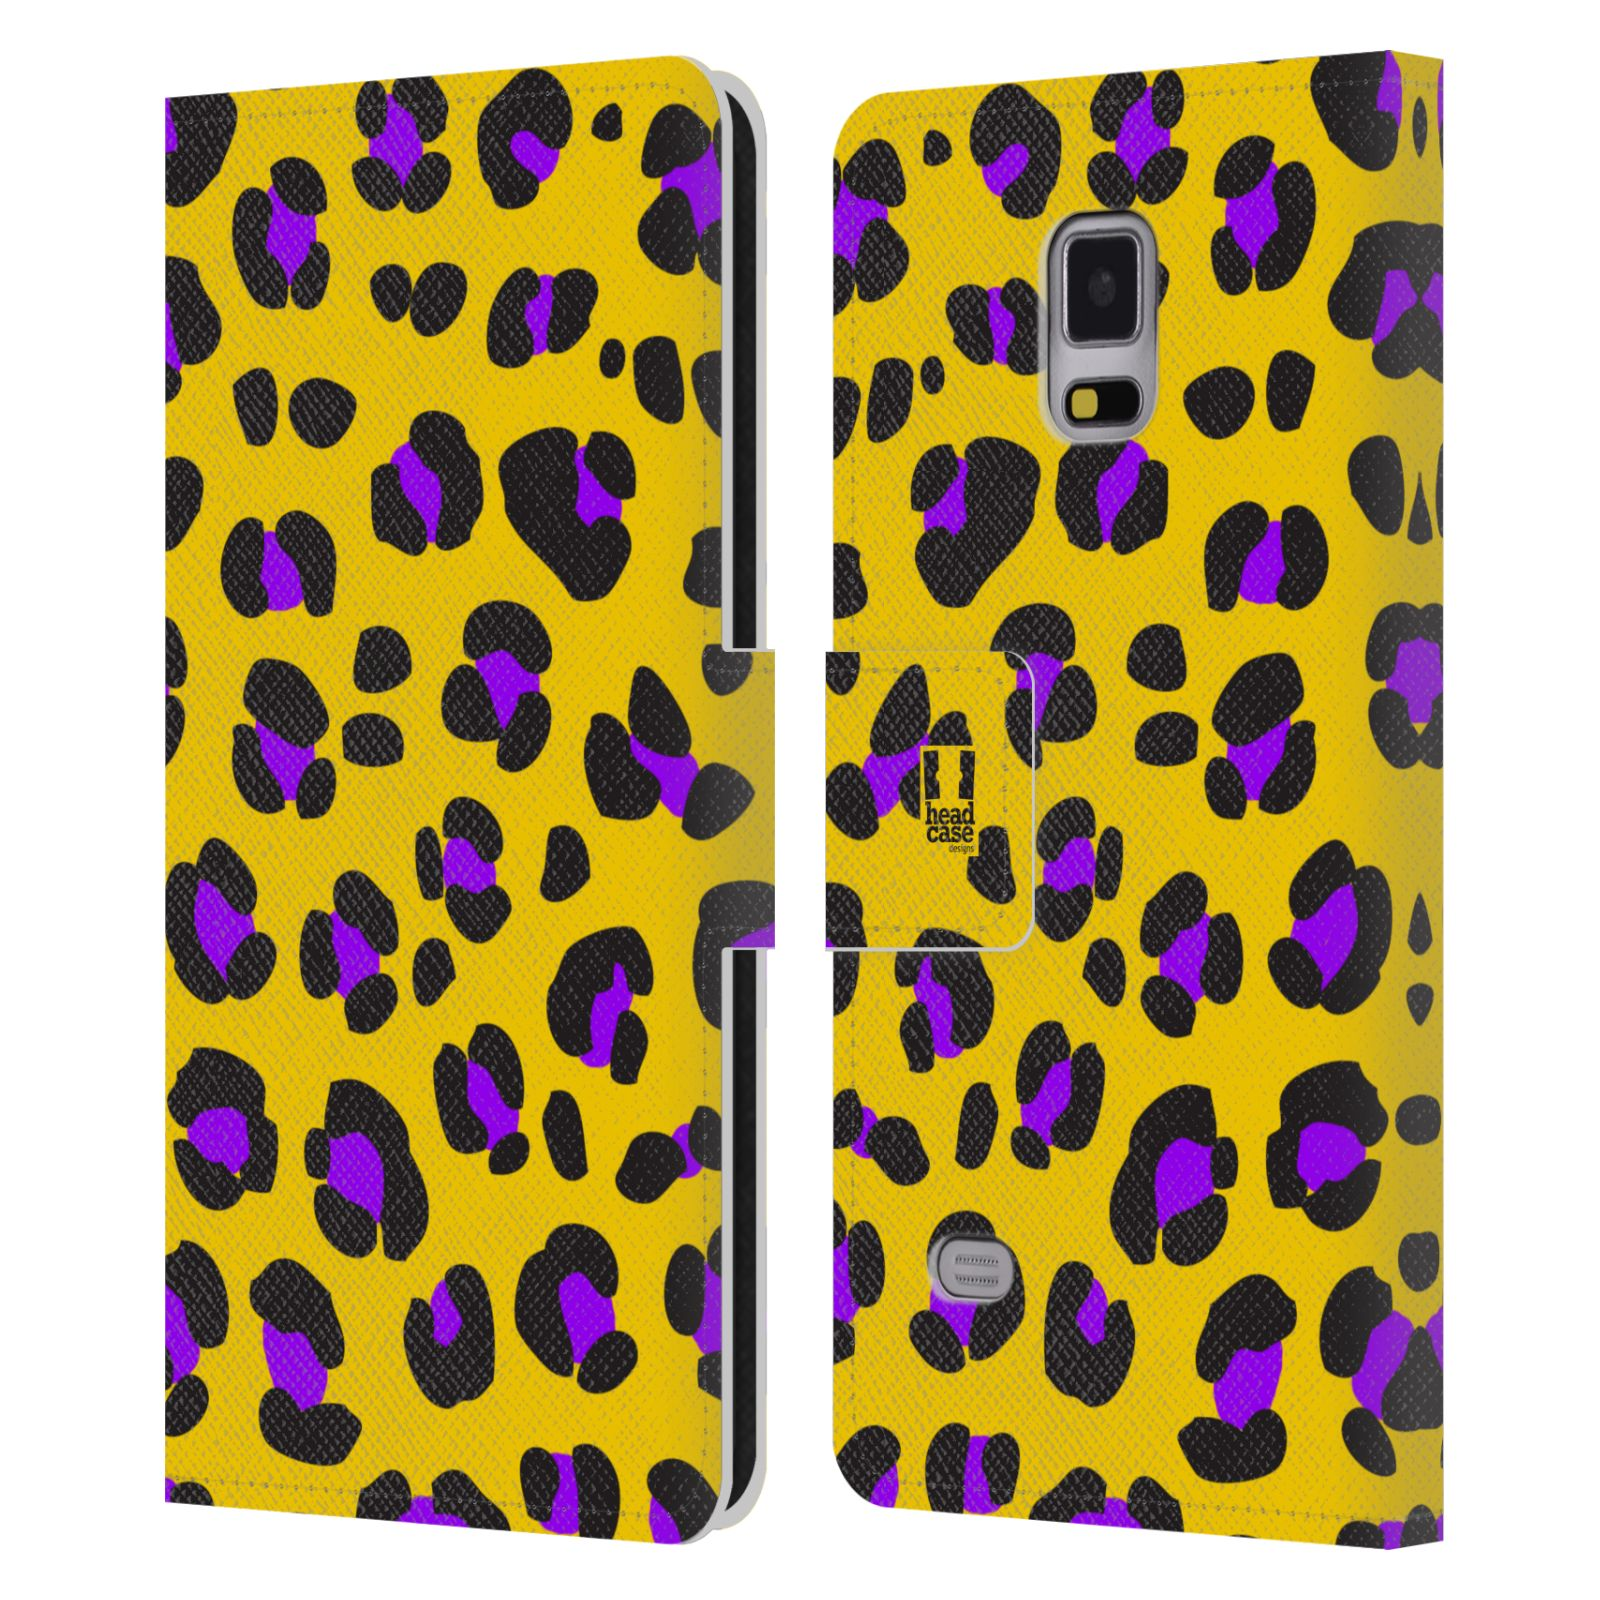 HEAD CASE Flipové pouzdro pro mobil Samsung Galaxy Note 4 Zvířecí barevné vzory žlutý leopard fialové skvrny